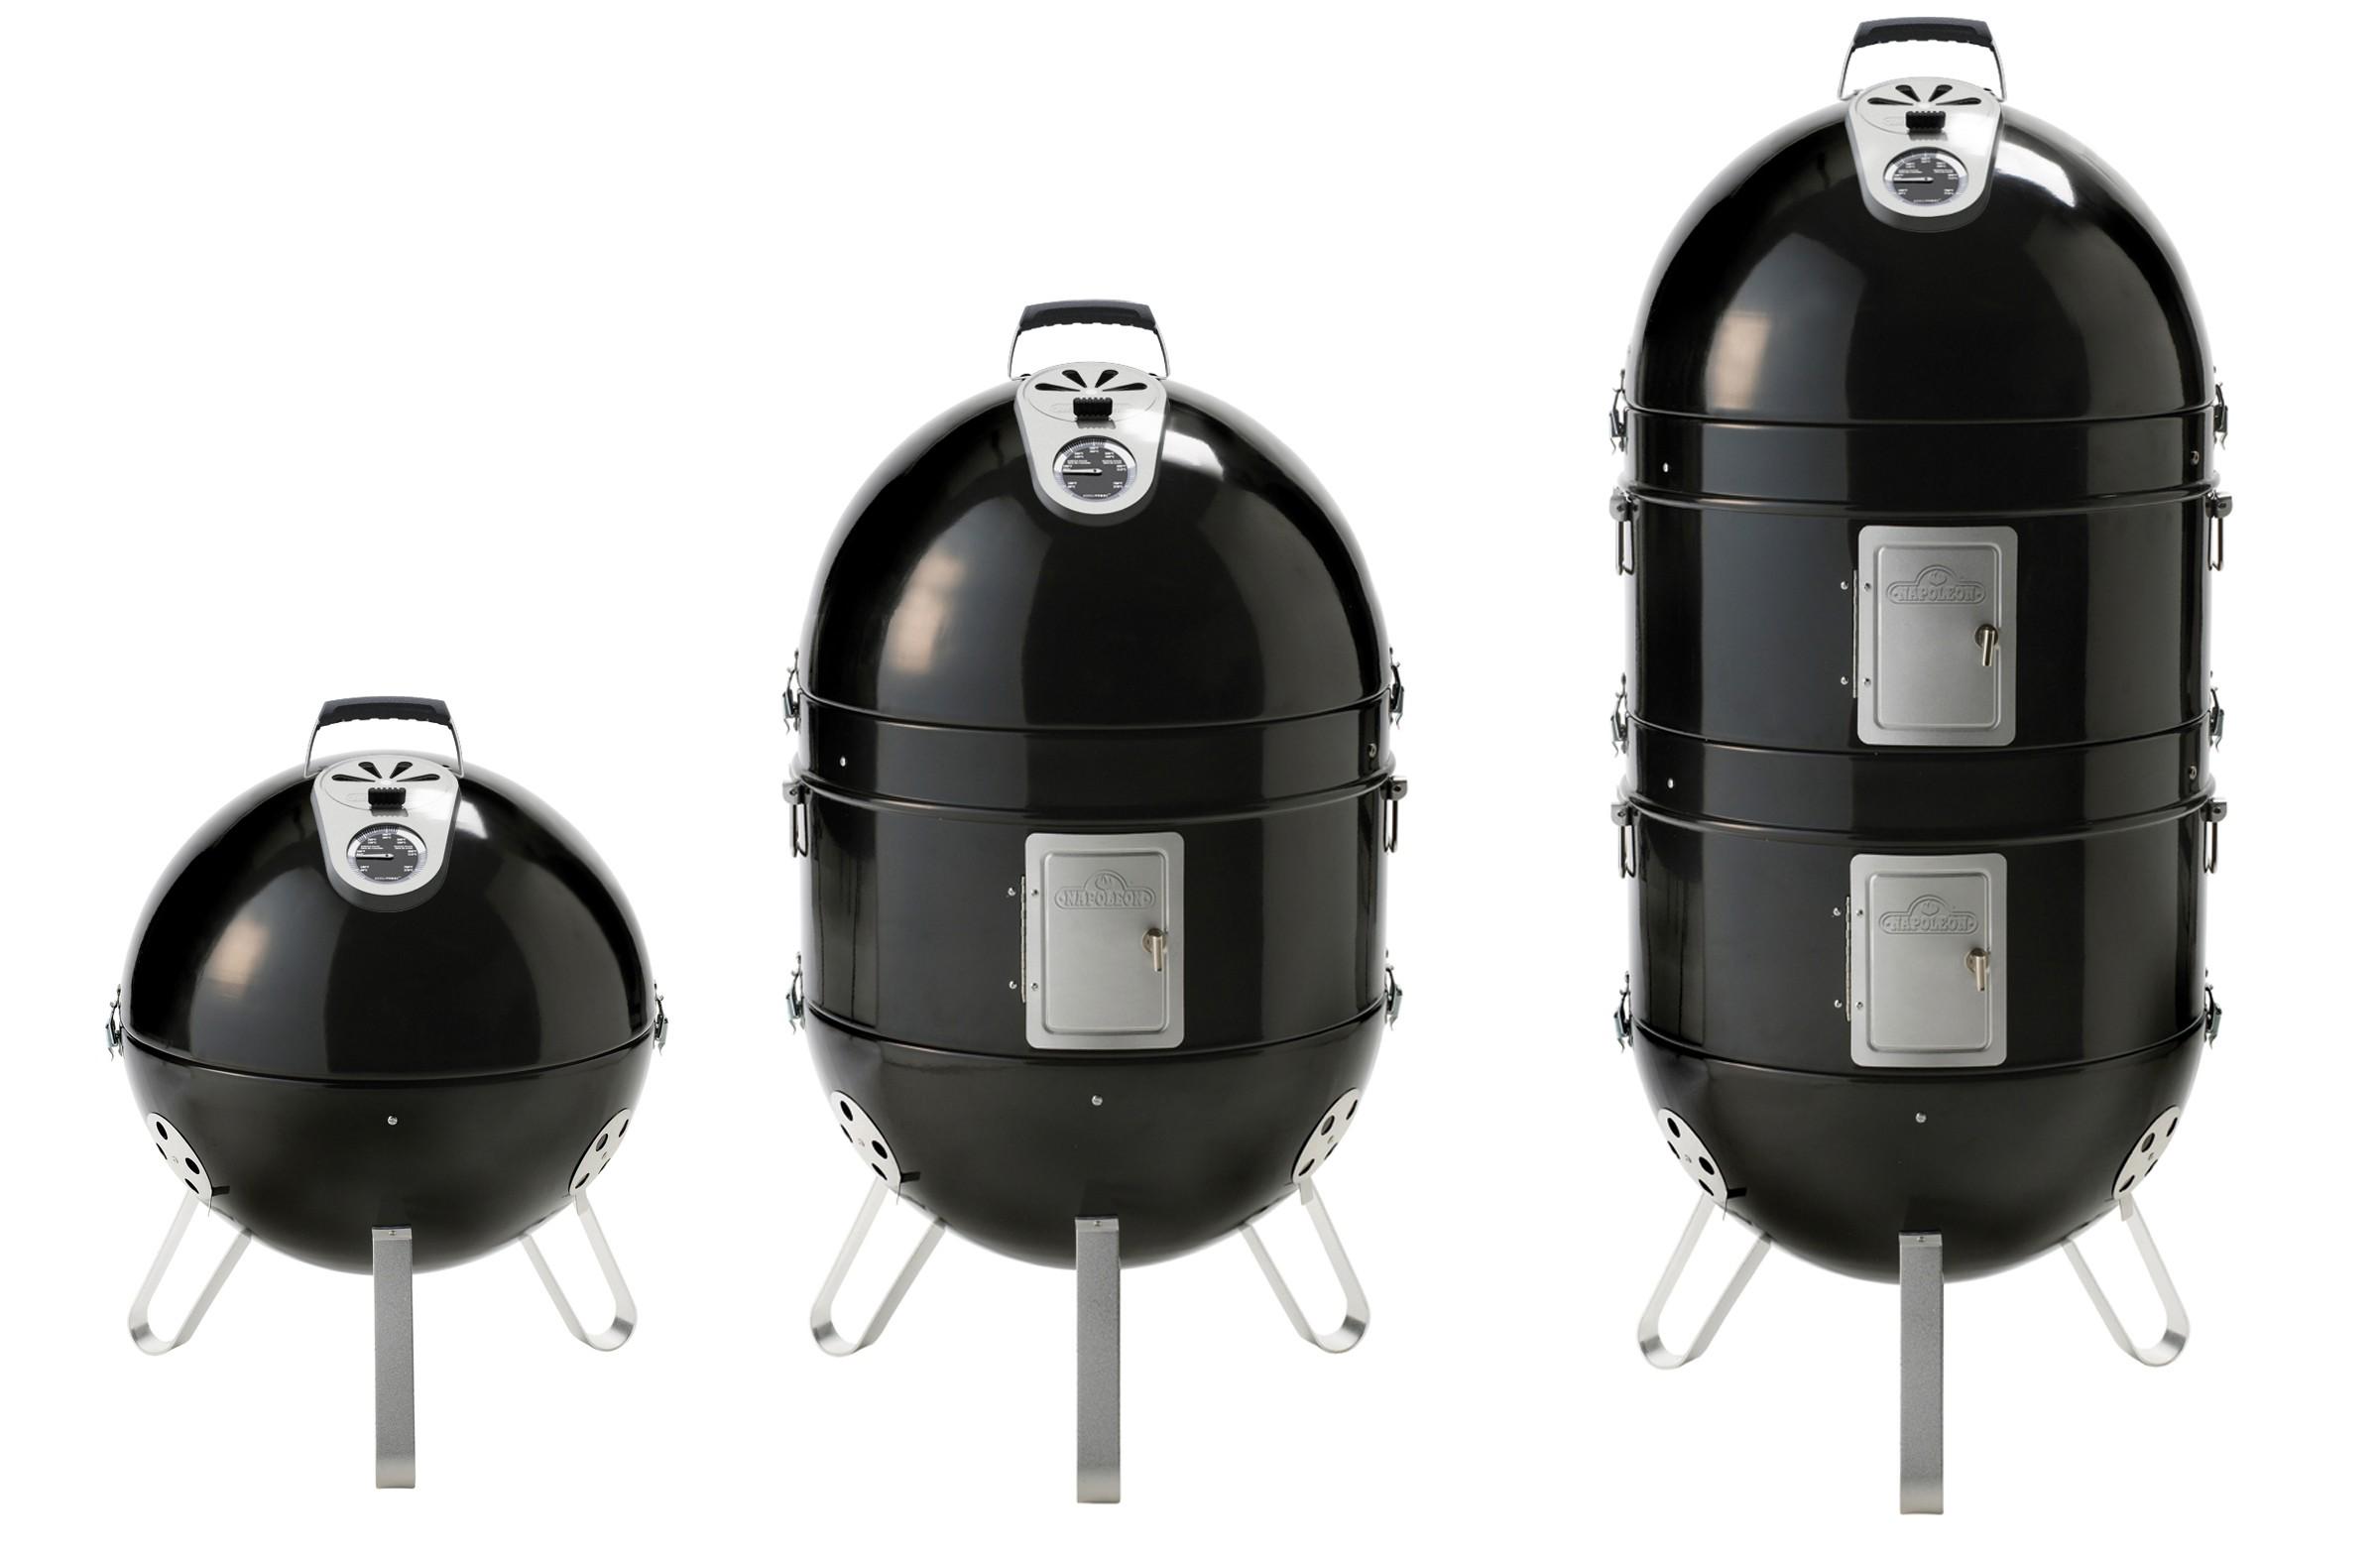 Kugelgrill / Holzkohle Grill Napoleon Apollo 3in1 Smoker AS300K Bild 3